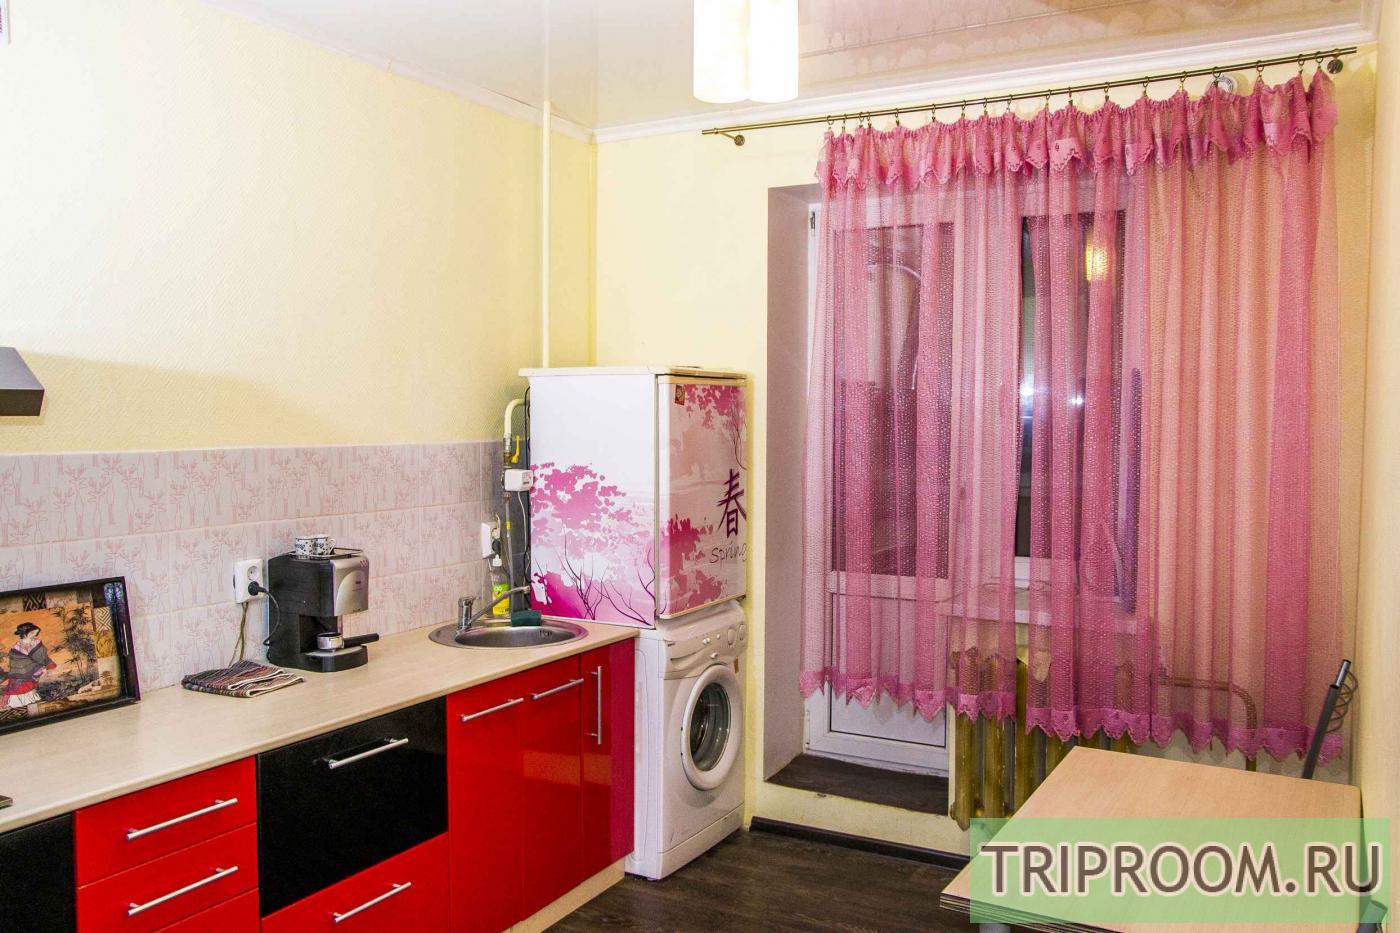 1-комнатная квартира посуточно (вариант № 14712), ул. Петра Смородина улица, фото № 8